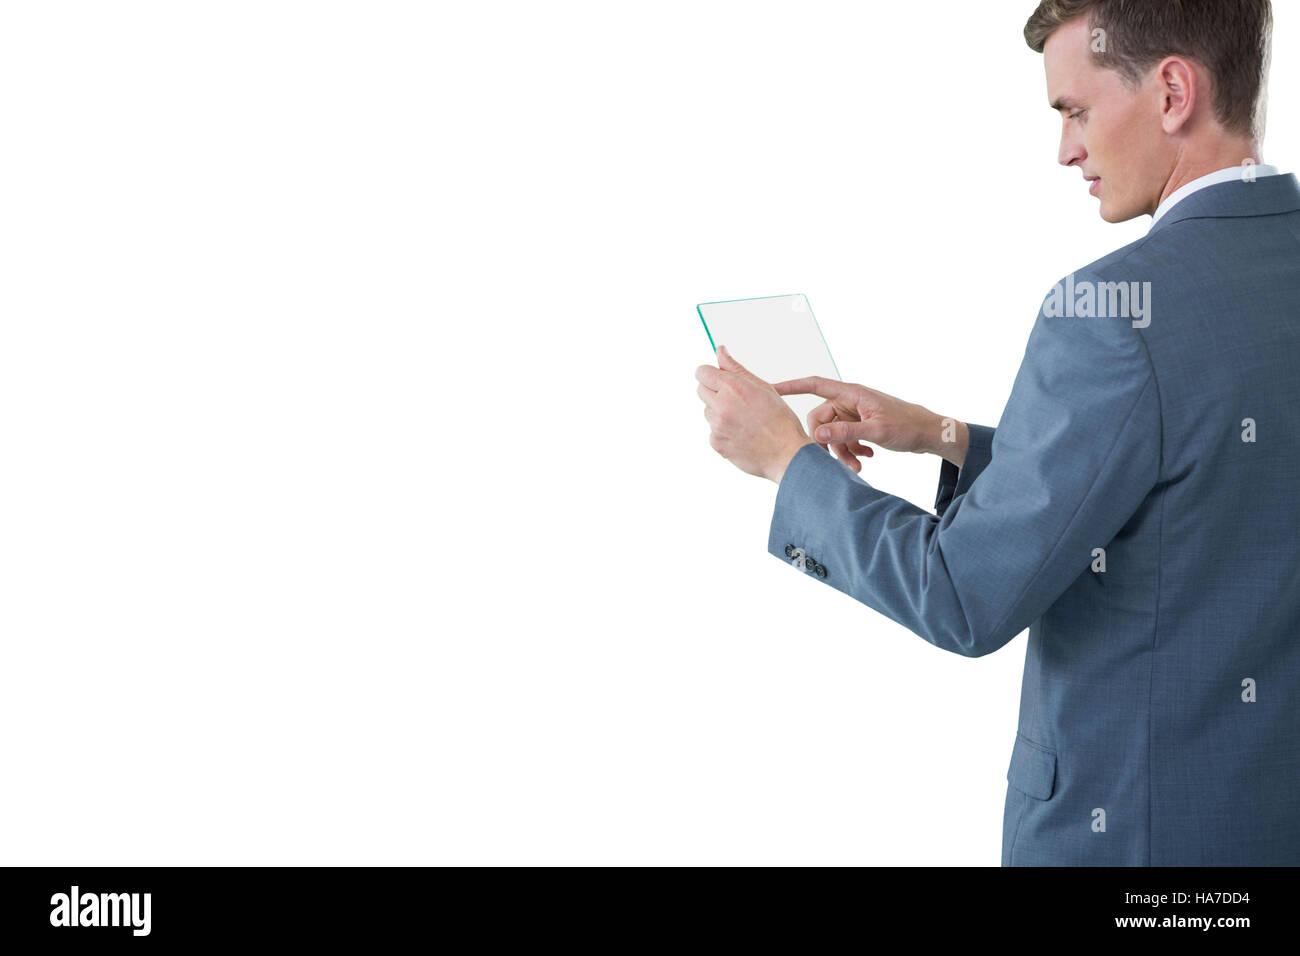 Businessman touching an glass sheet - Stock Image